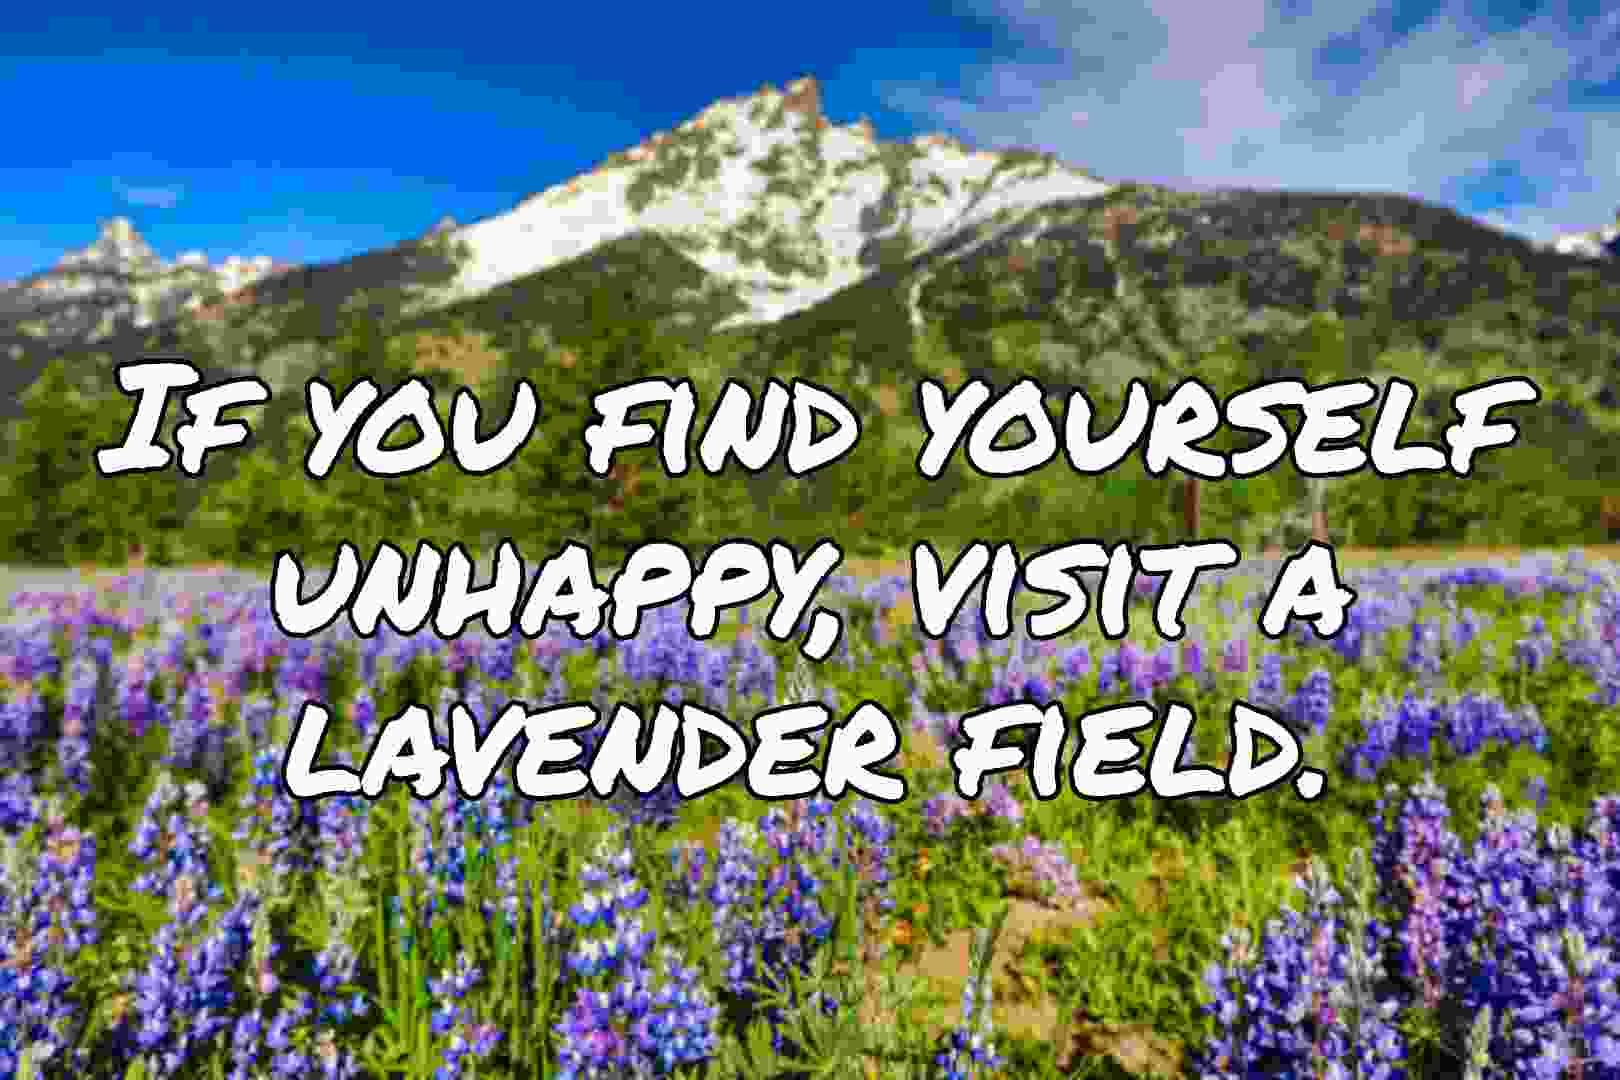 Lavender field captions for Instagram